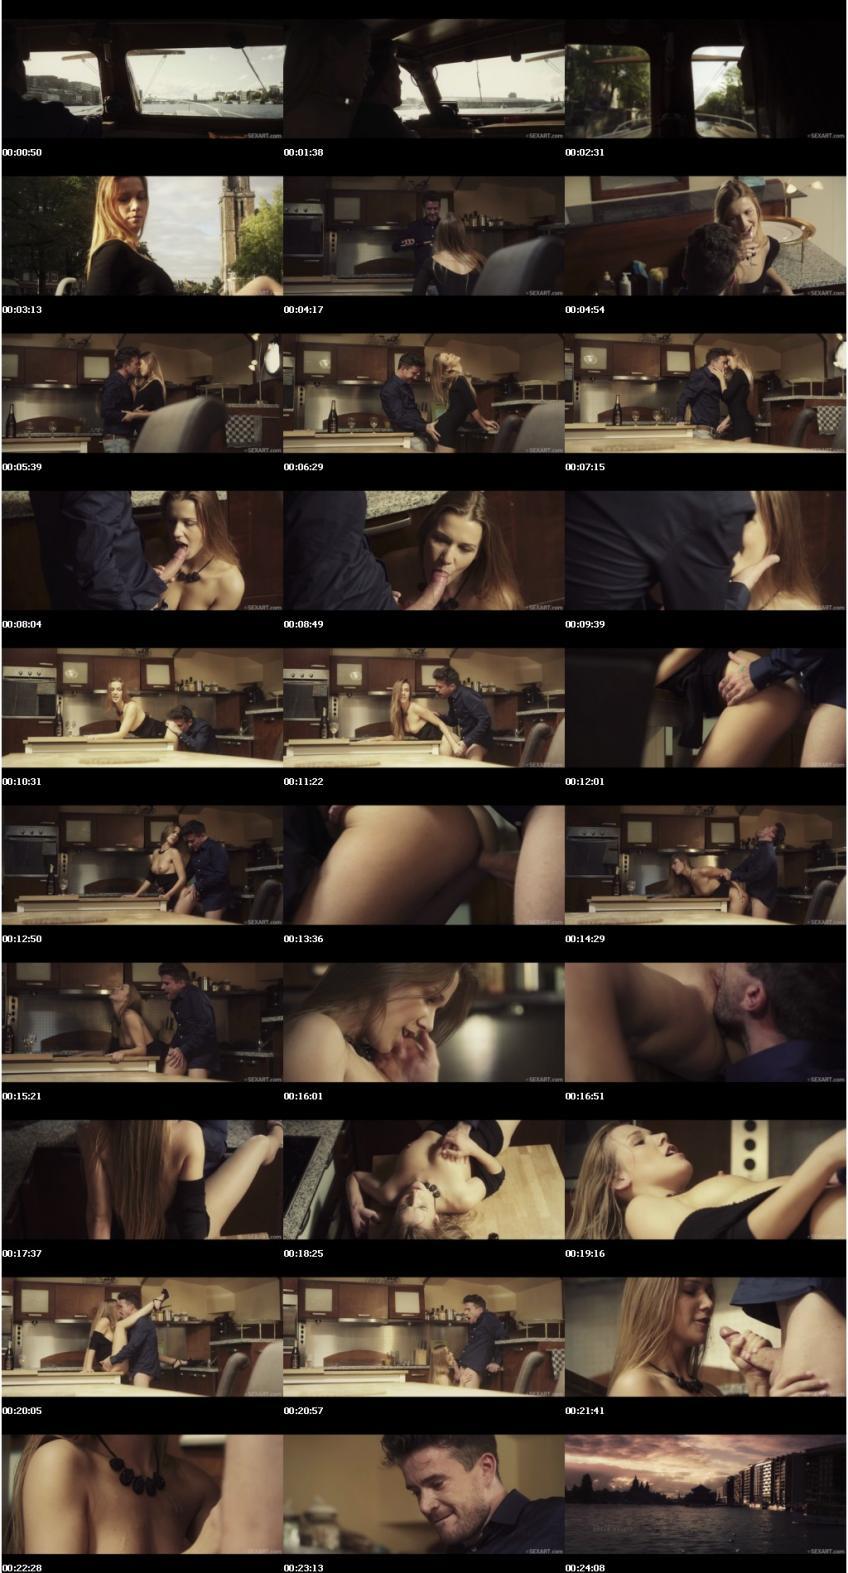 SexArt.16.02.24.Alexis.Crystal.River.XXX.1080p.MP4-KTR